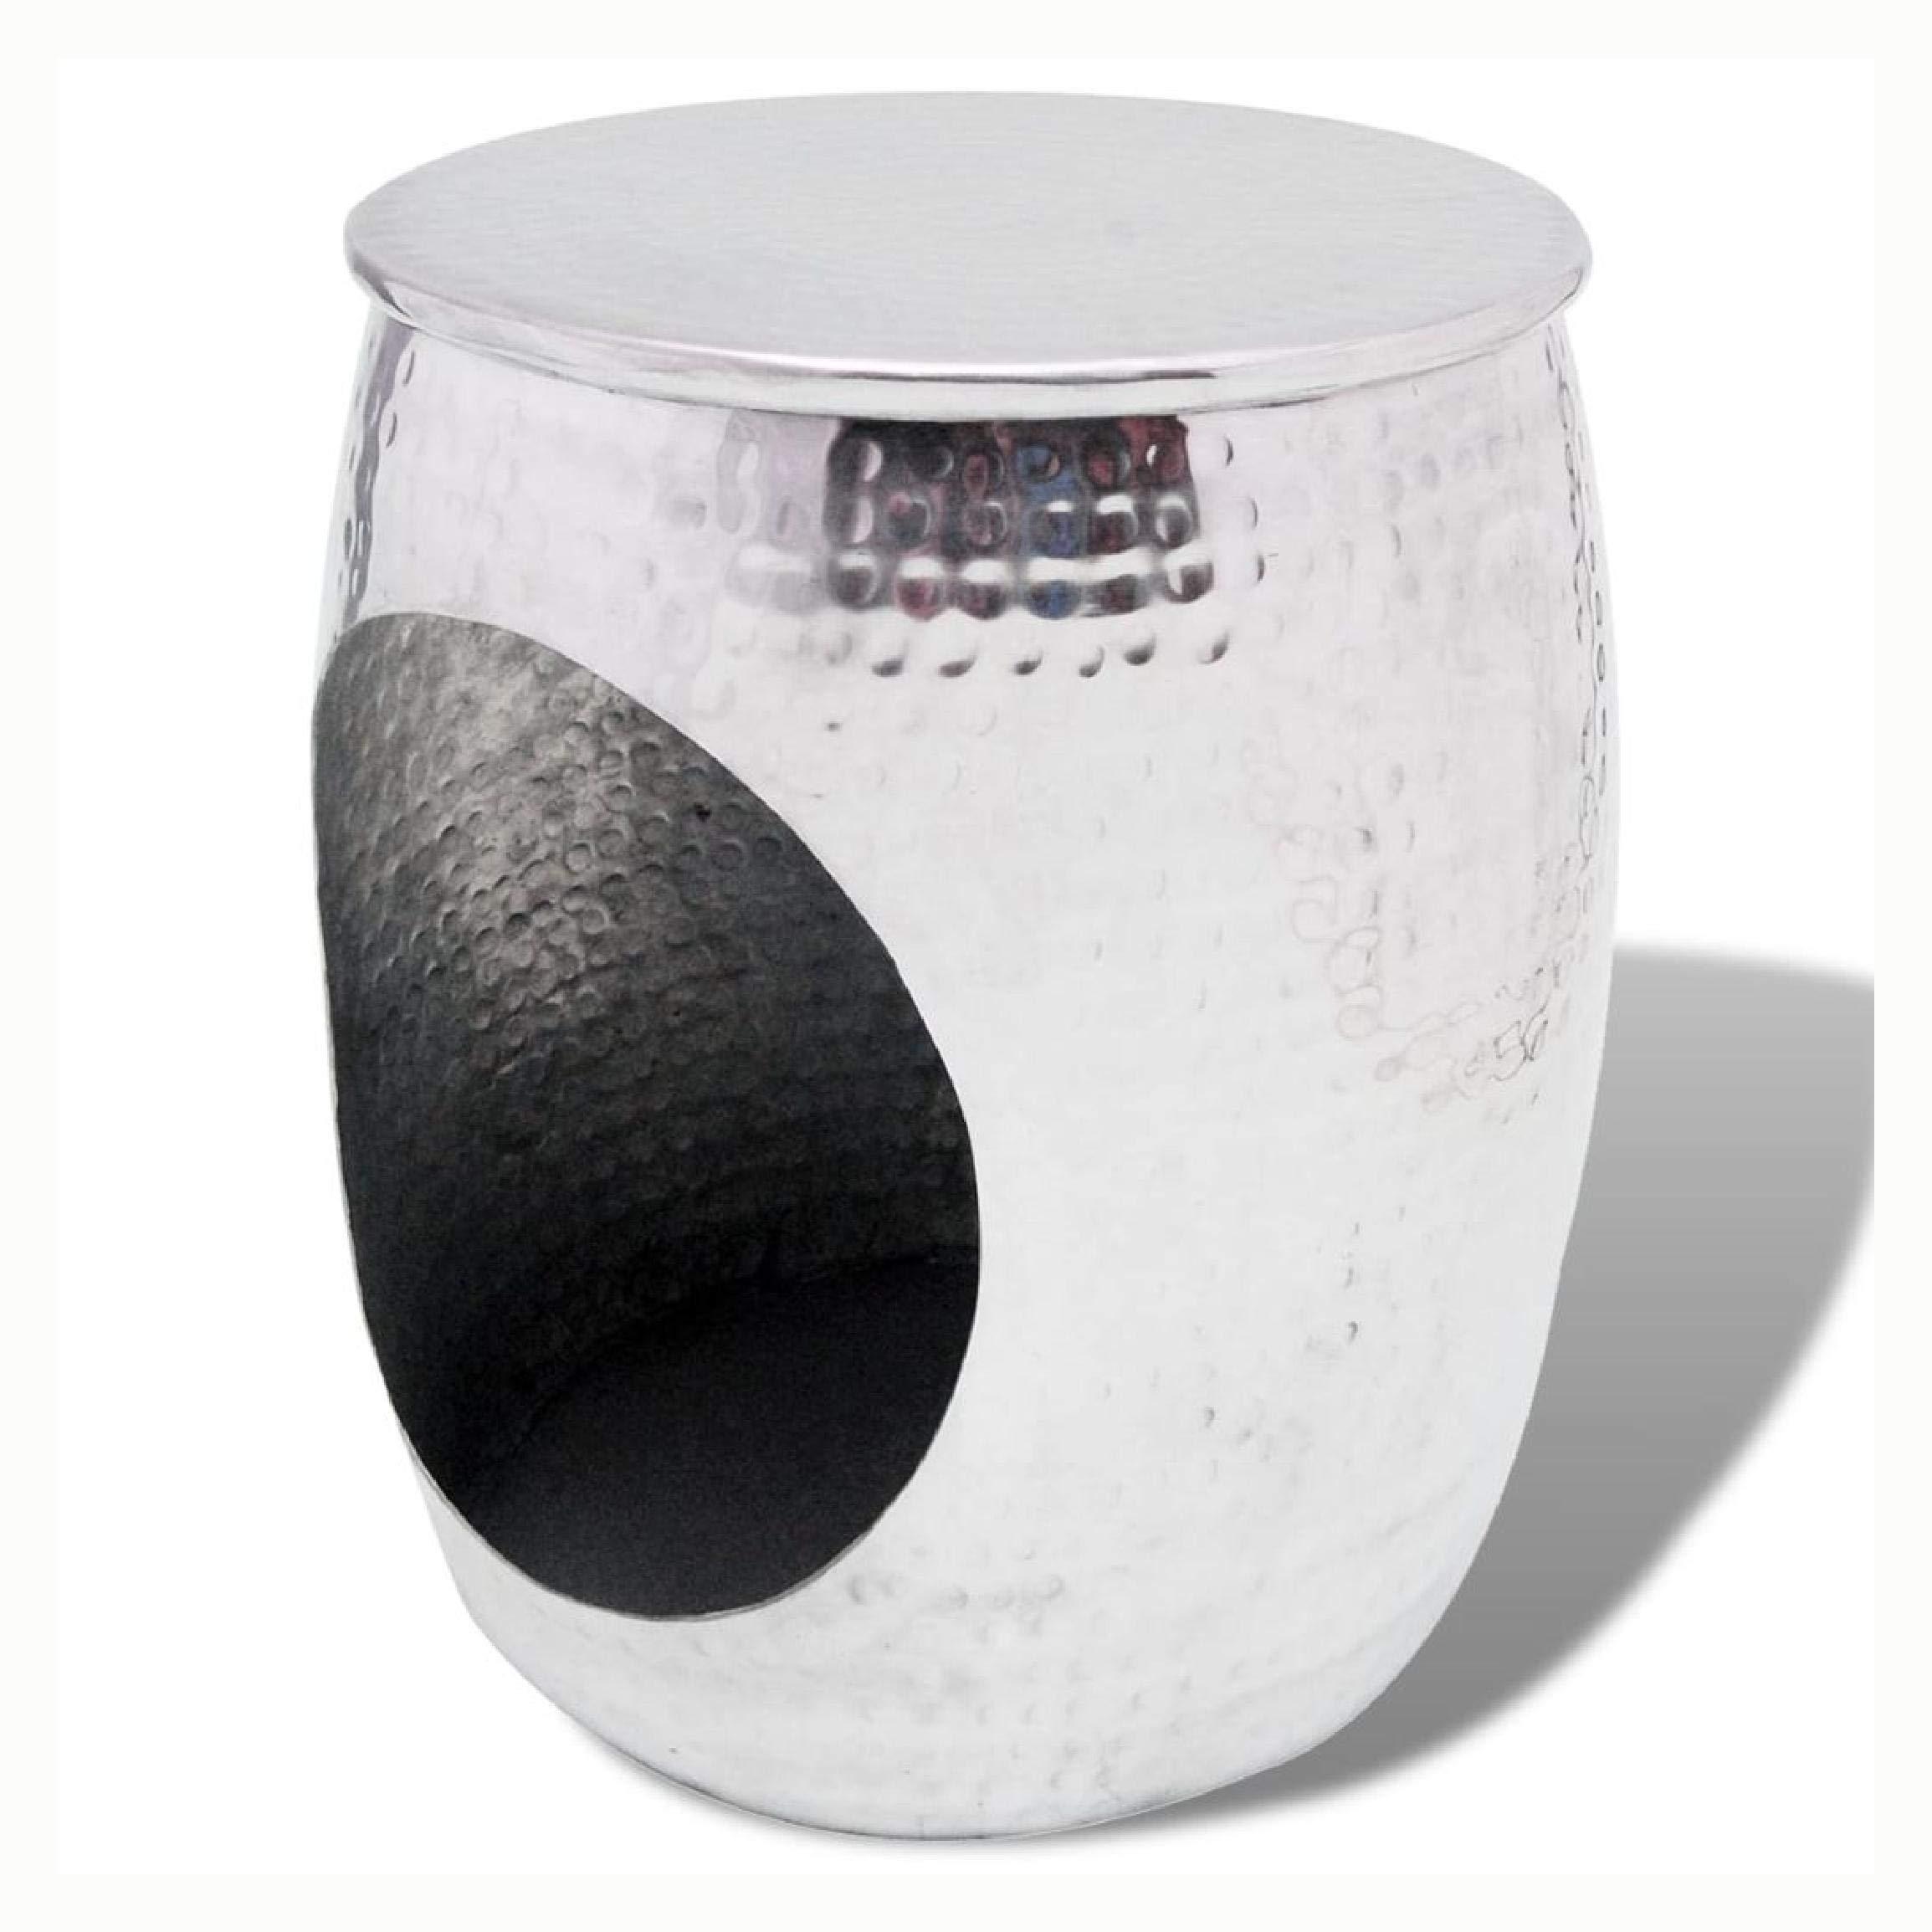 K&A Company Hocker/Side Table Barrel Shape Aluminum Silver by K&A Company (Image #2)